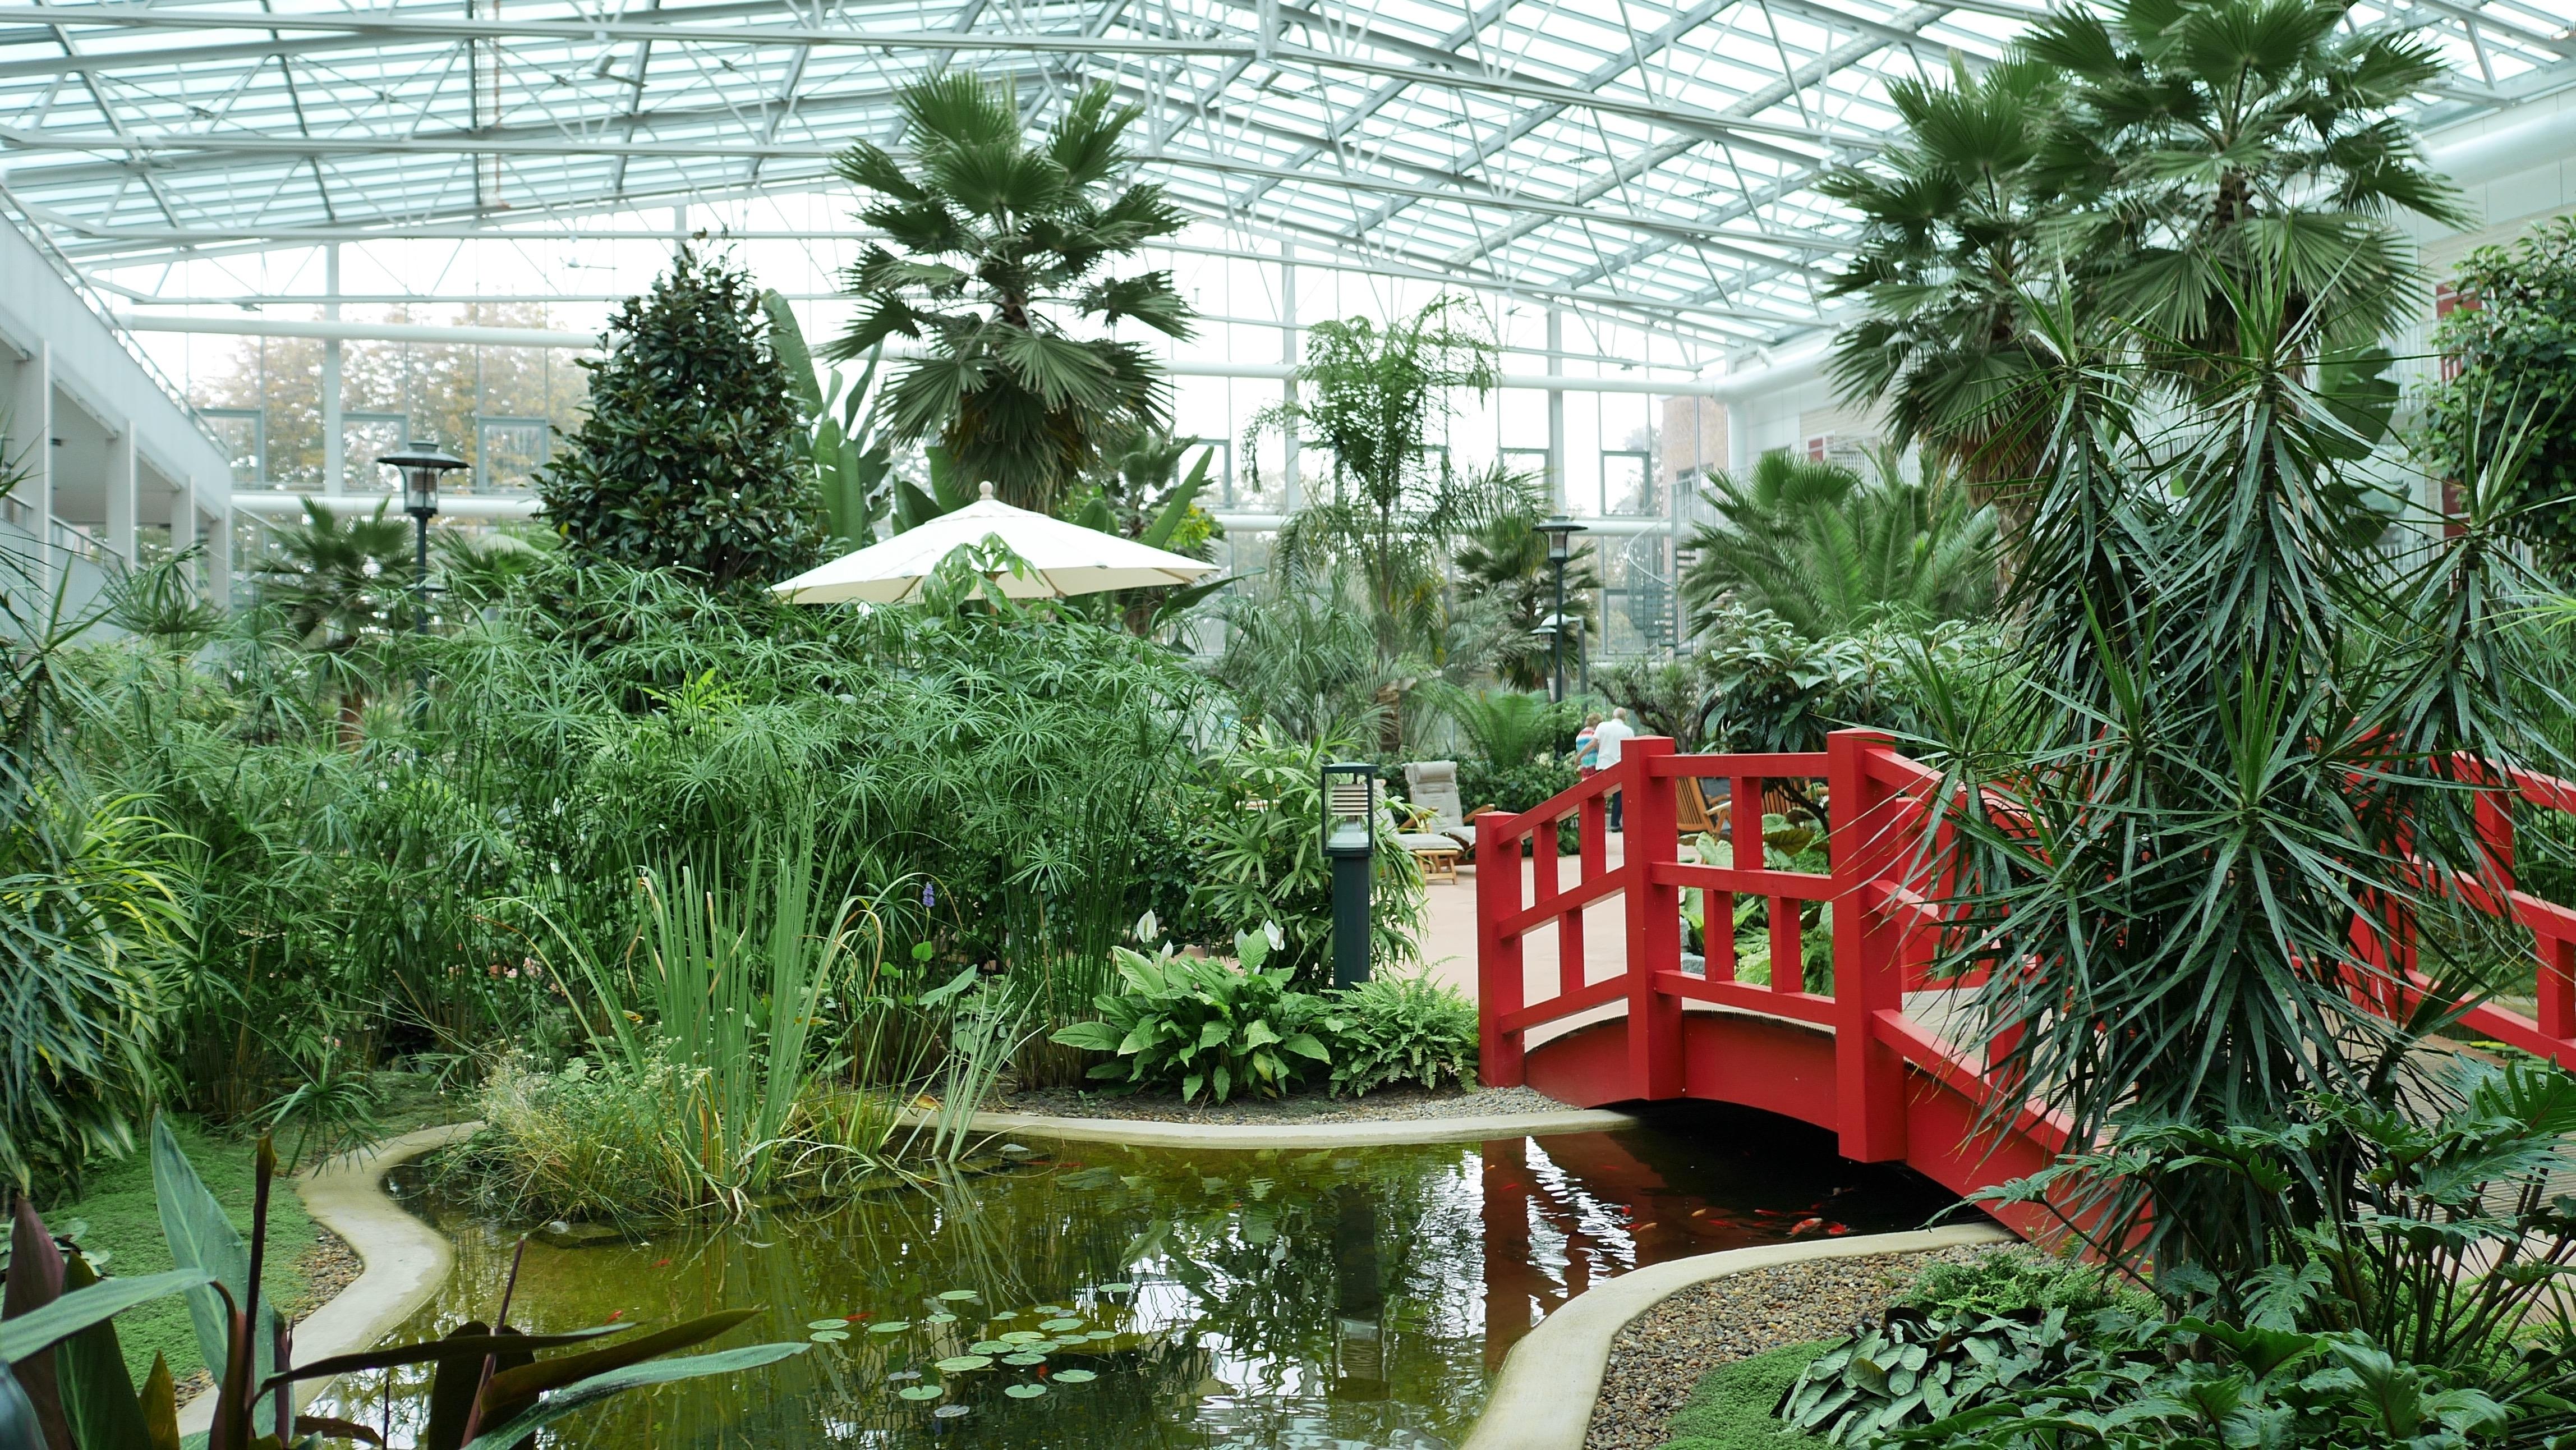 Bovieran Winter Garden